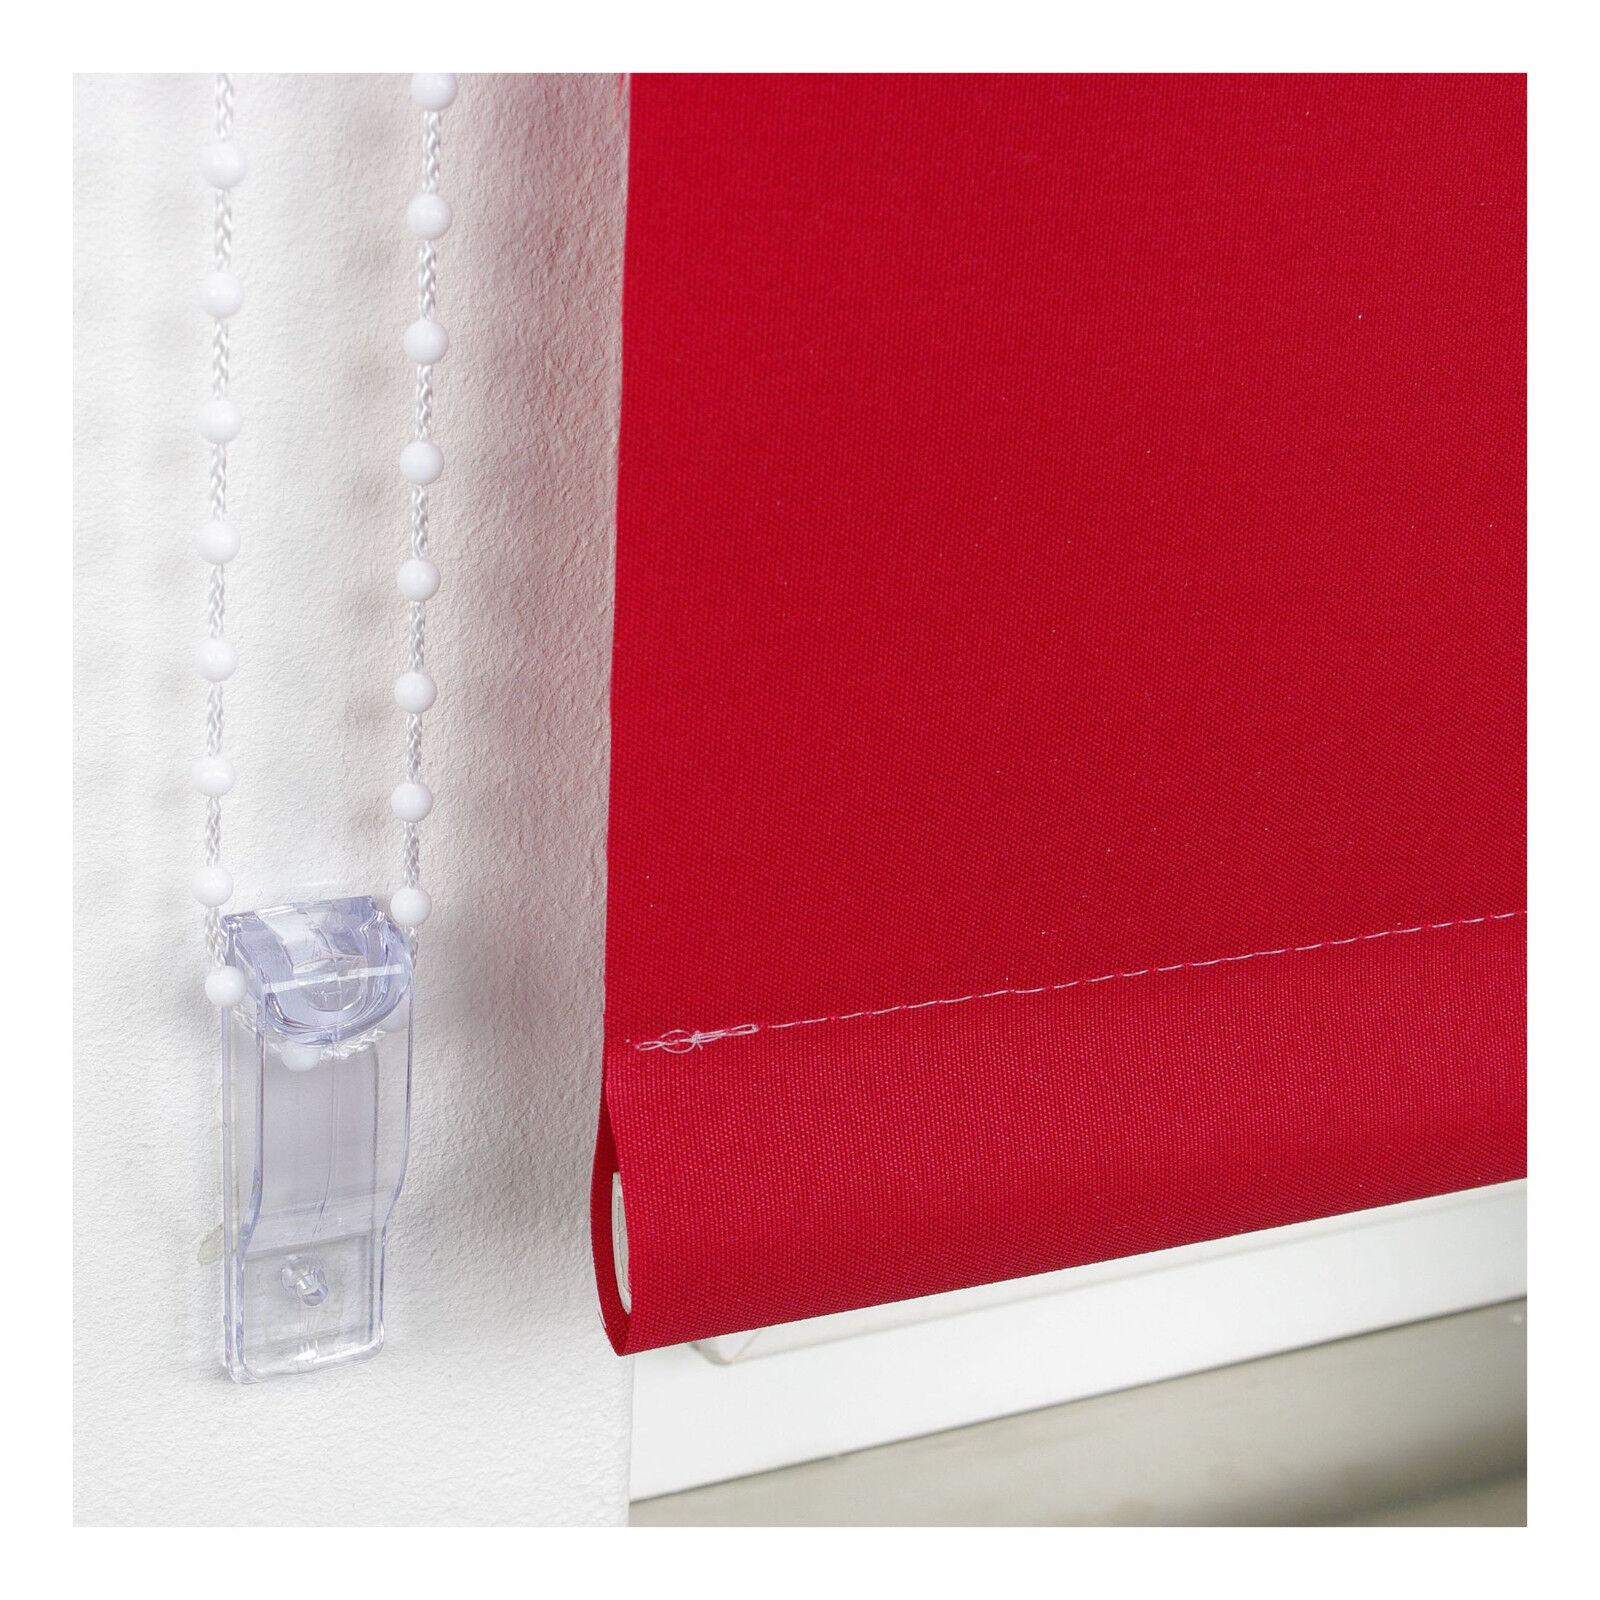 Kettenzugrollo Rot Seitenzugrollo Tür Fensterrollo Sichtschutz Sichtschutz Sichtschutz Dekoration 9b4331